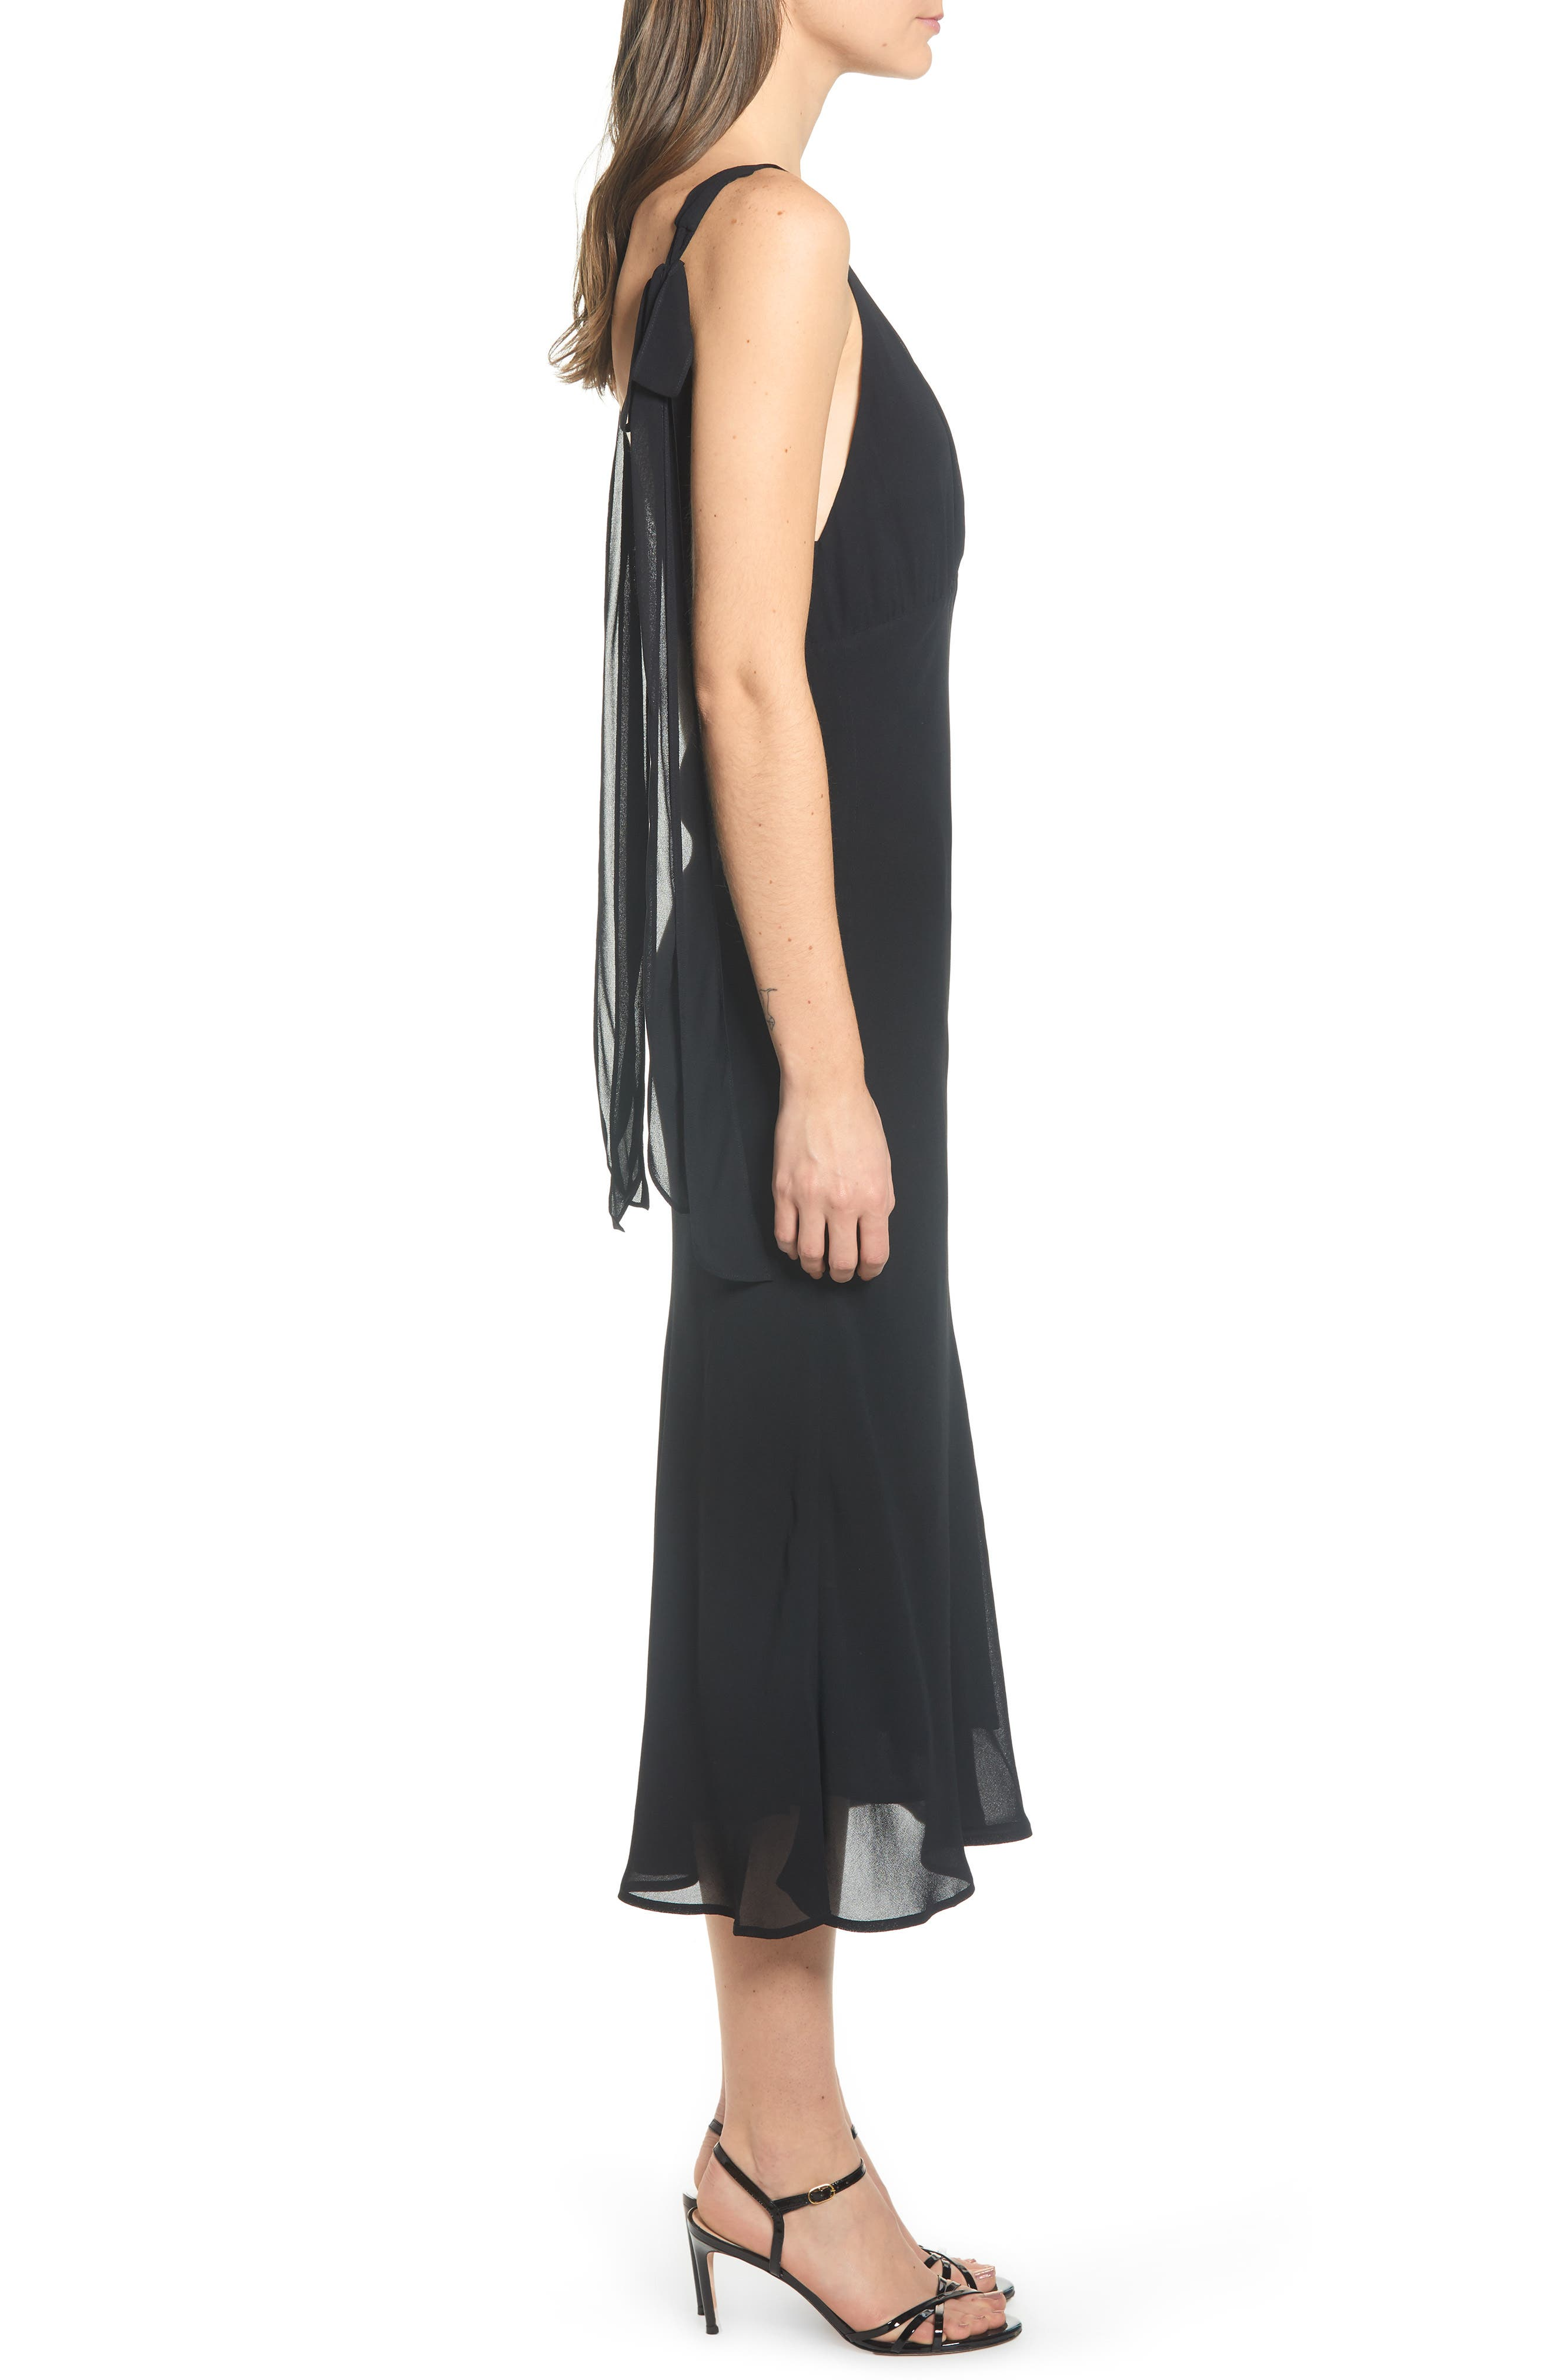 REFORMATION, Venezia Dress, Alternate thumbnail 4, color, BLACK